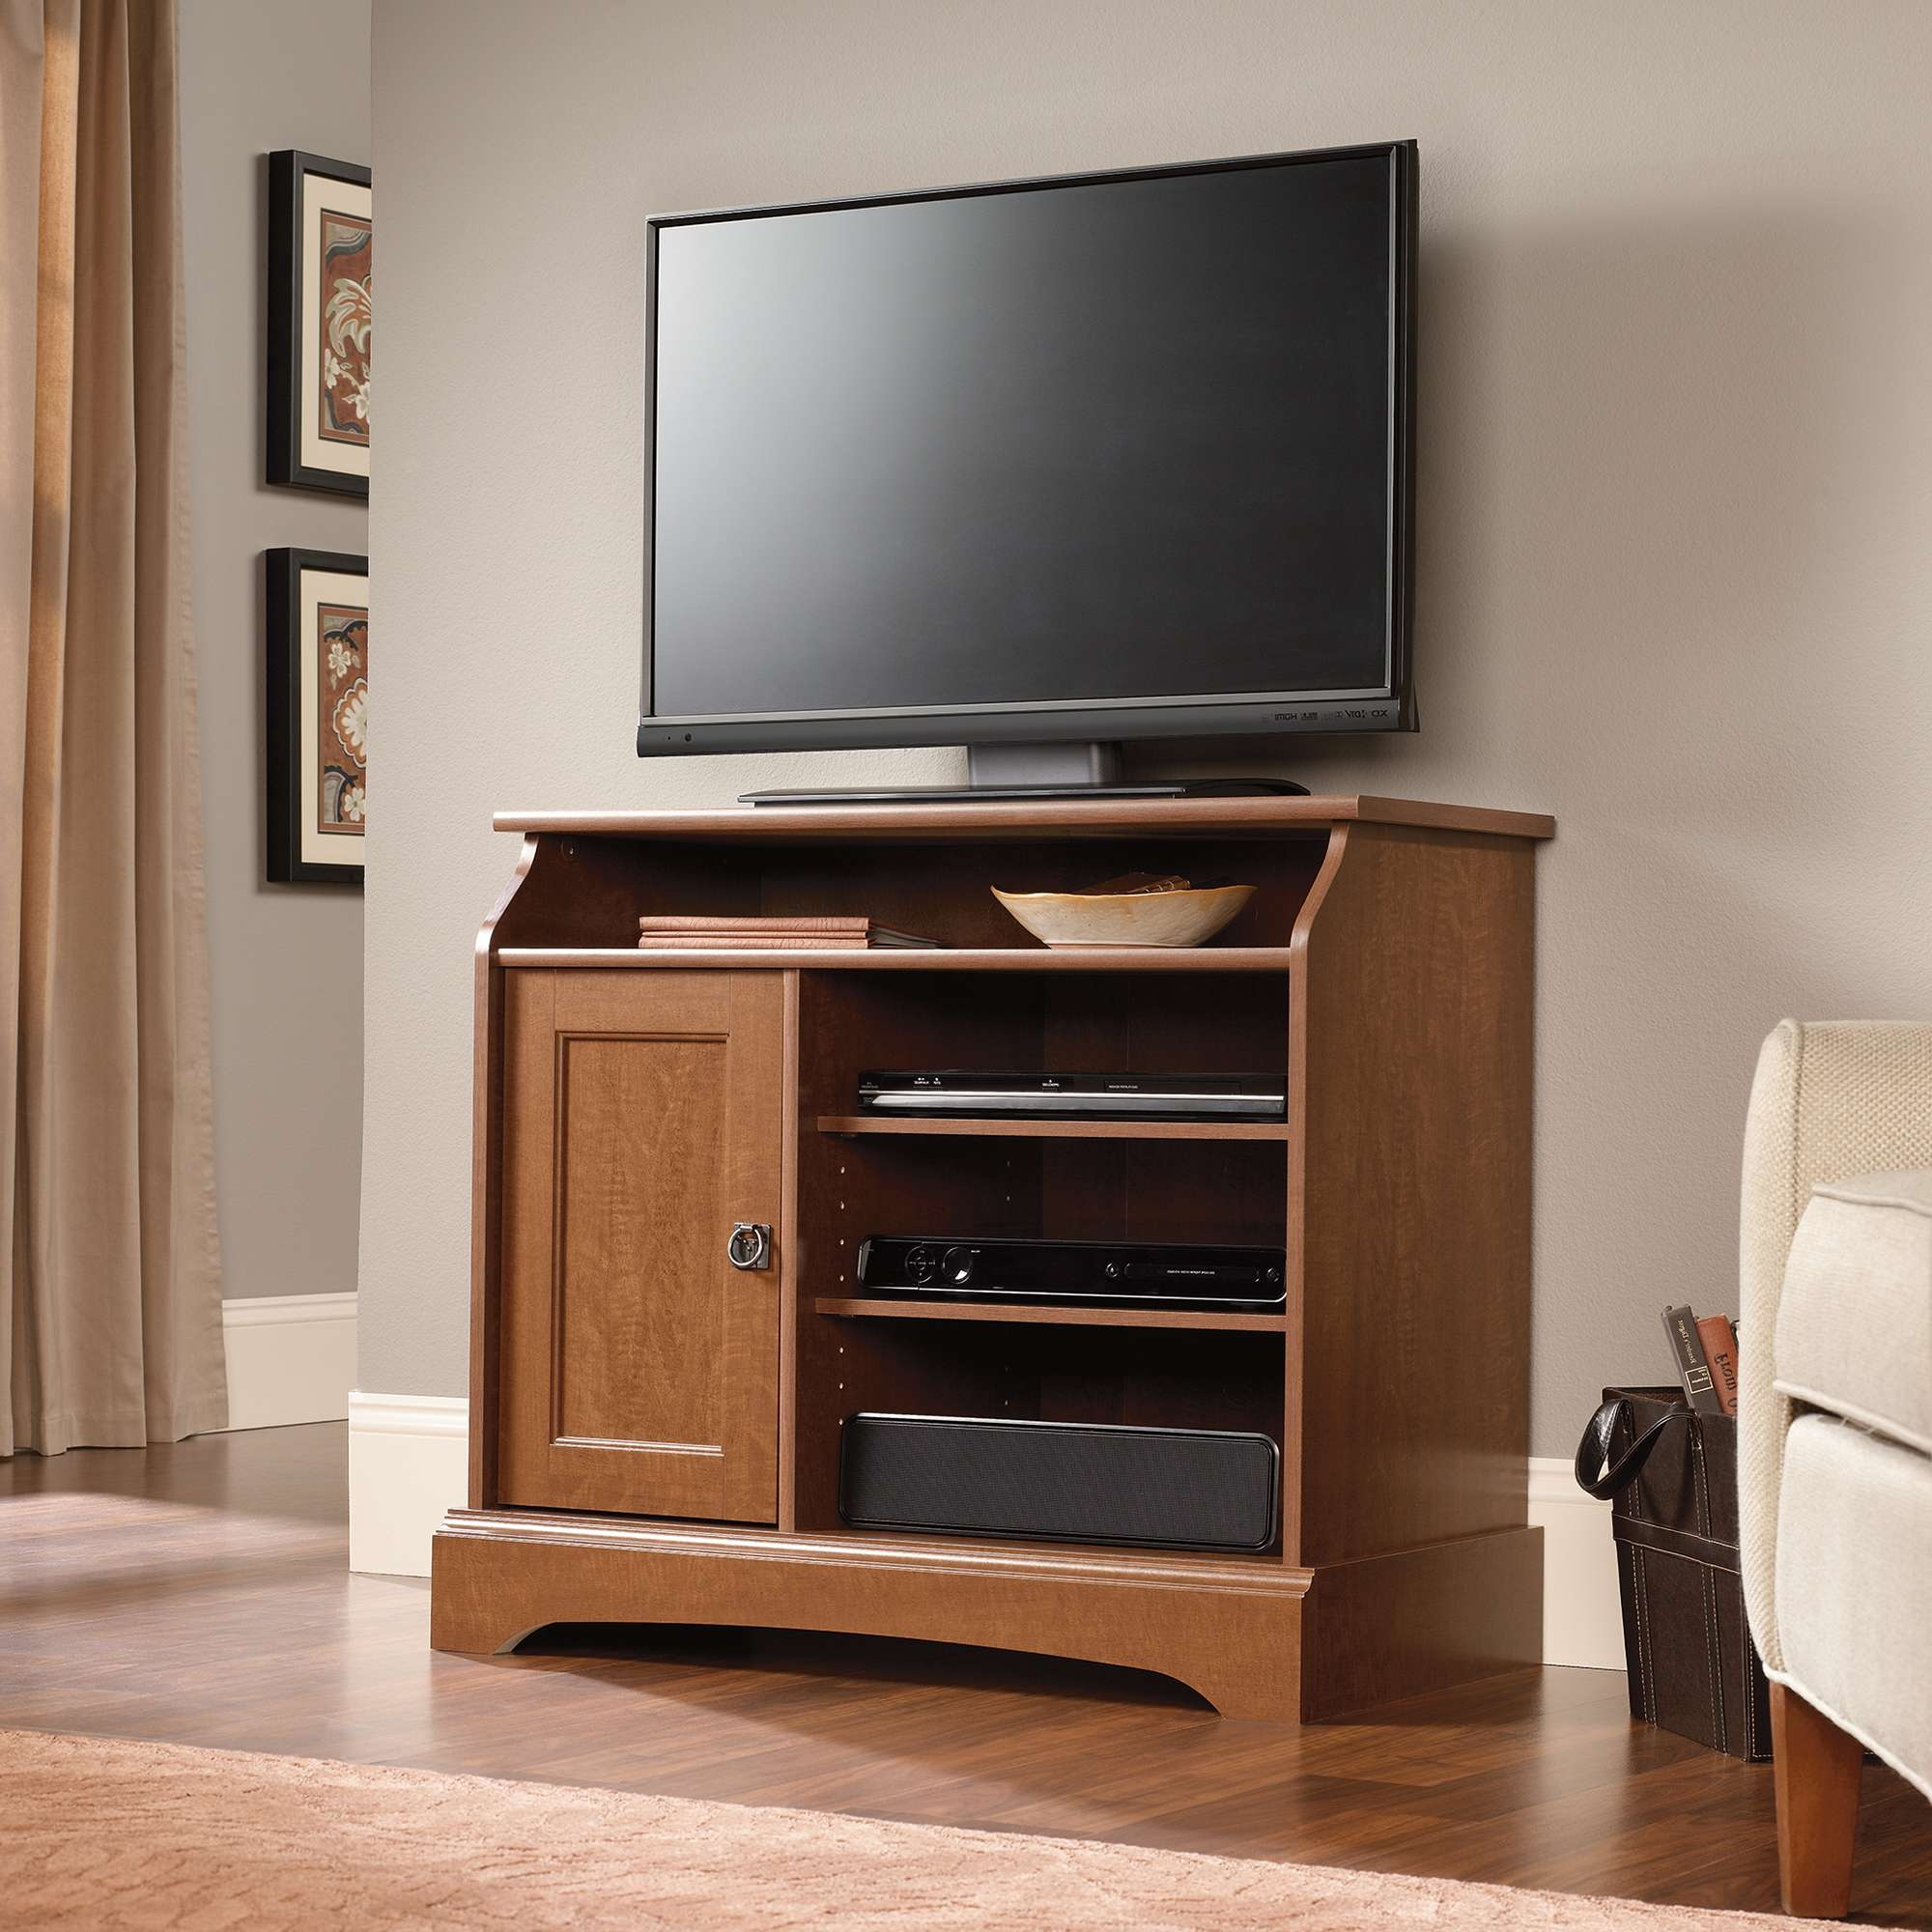 Sauder Select | Highboy Tv Stand | 408972 | Sauder With Regard To Highboy Tv Stands (View 14 of 15)